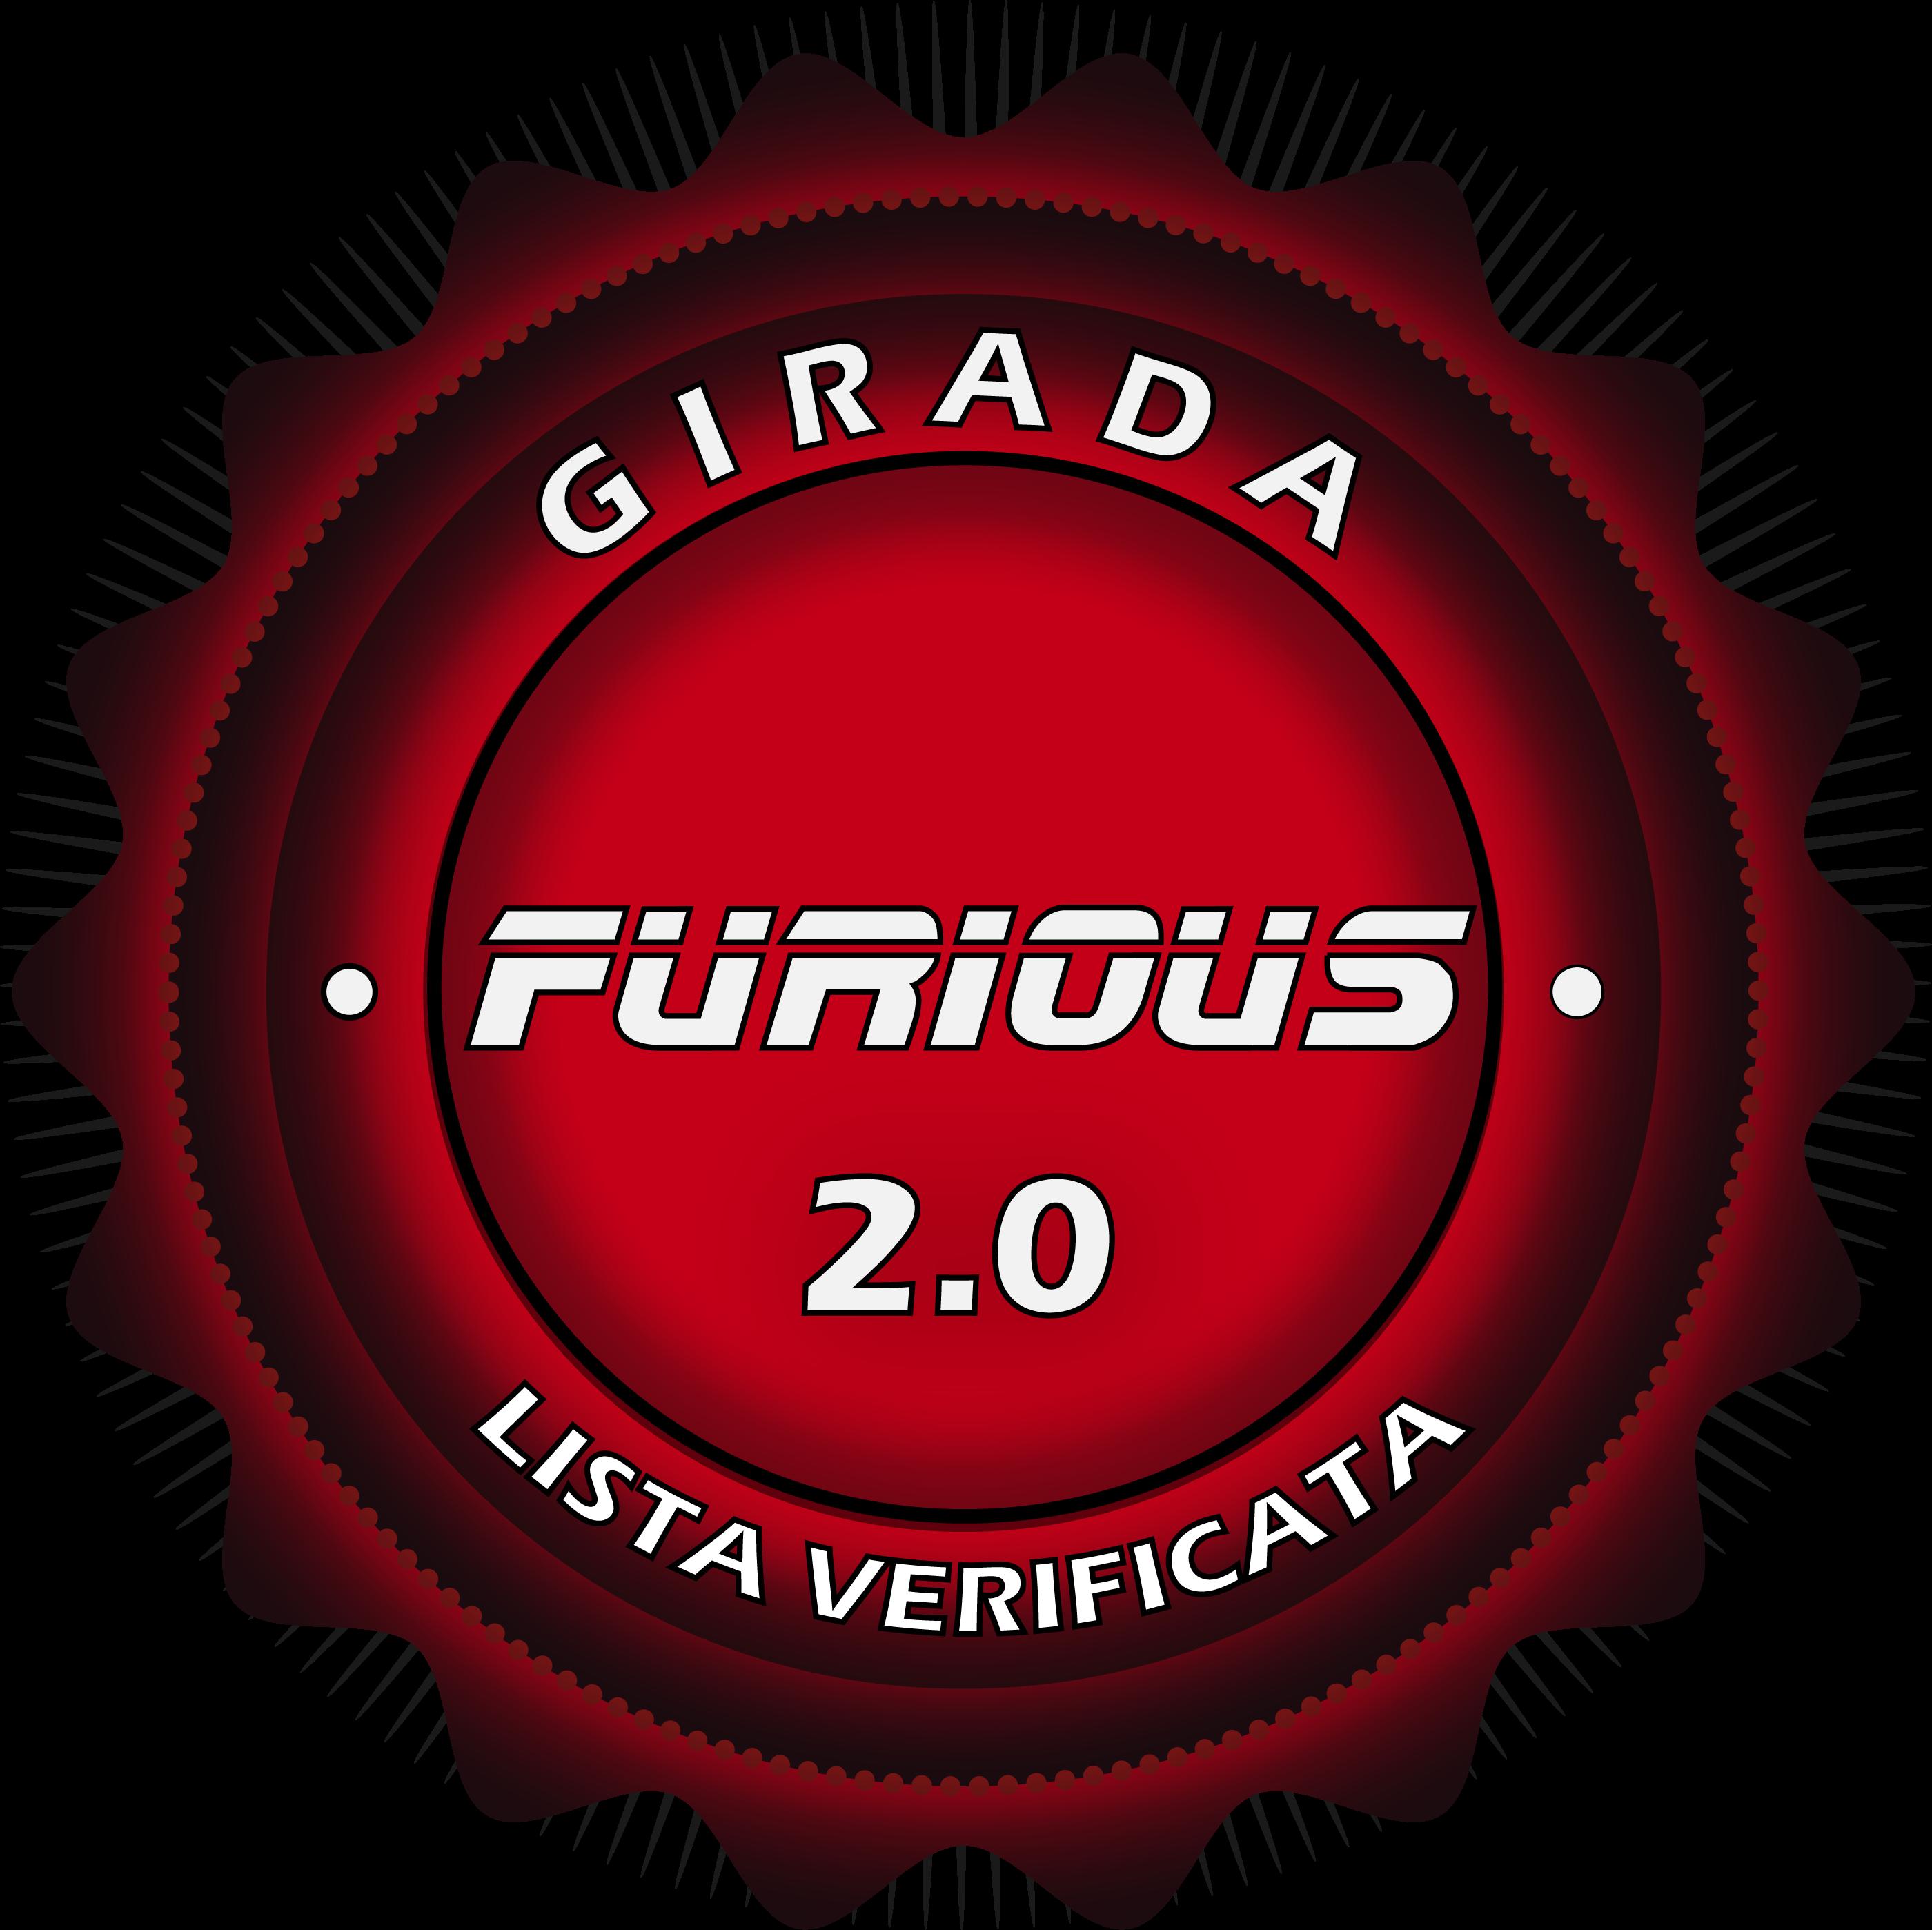 Donazioni per sponsor Girada Furious 2.0